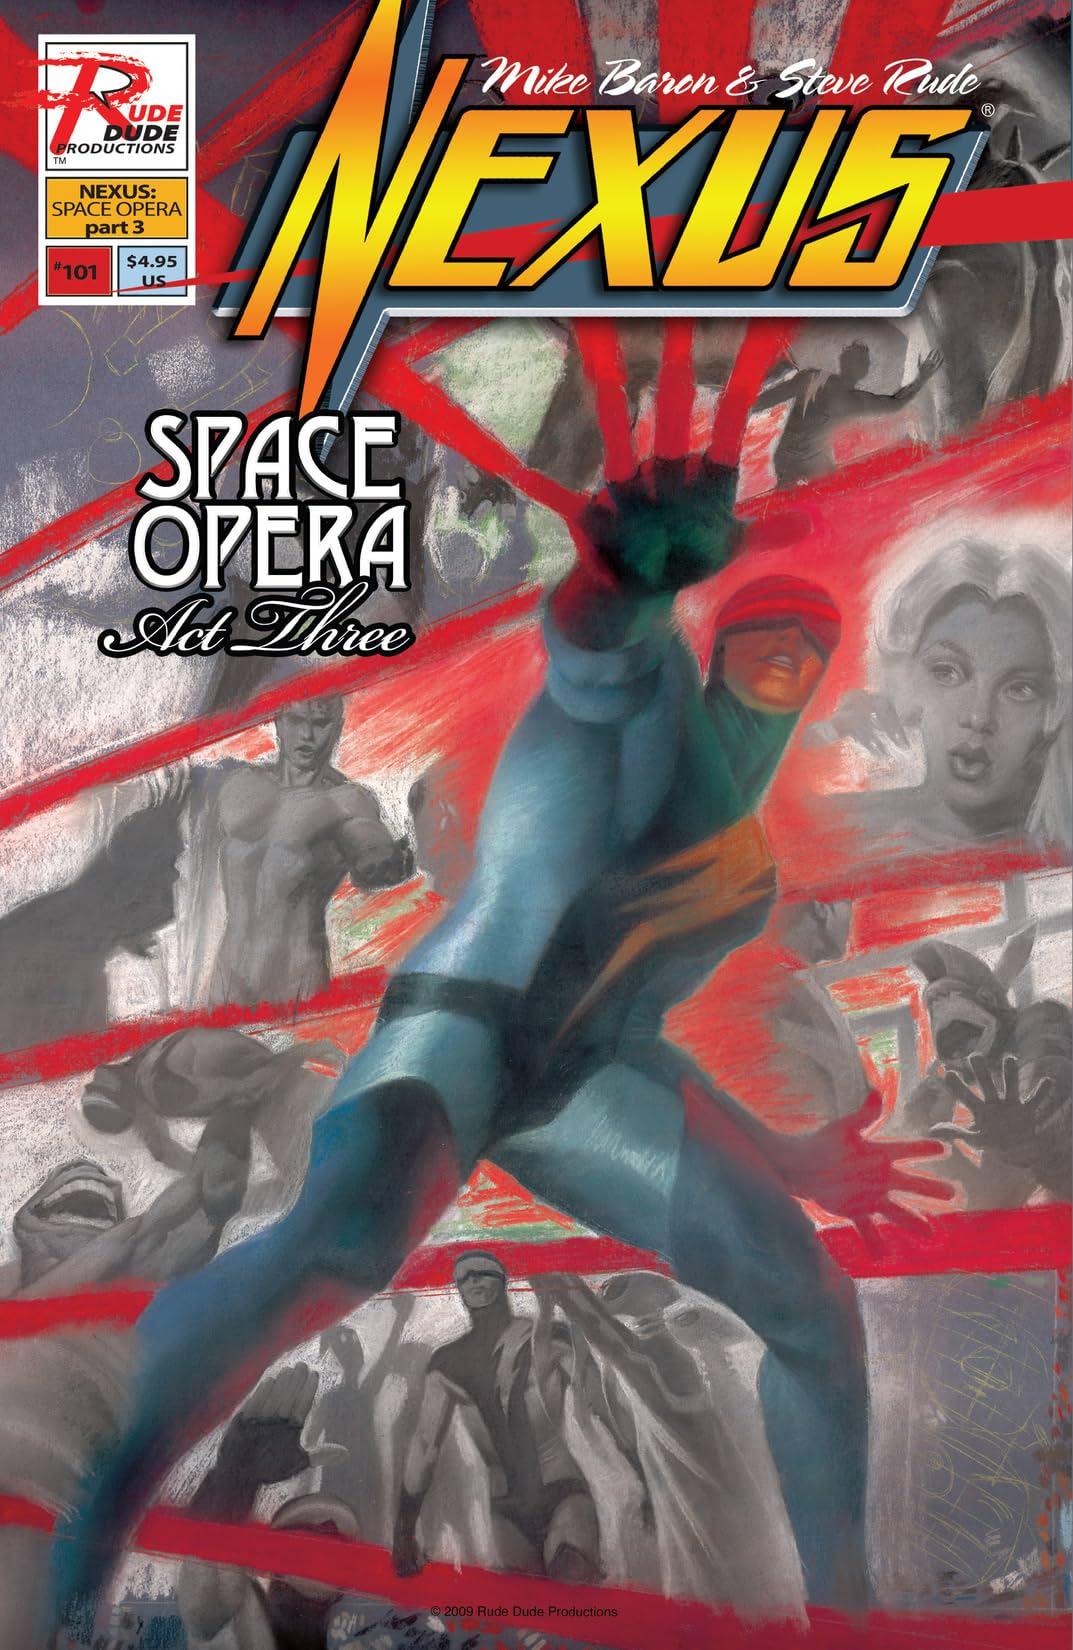 Nexus: Space Opera #101-102